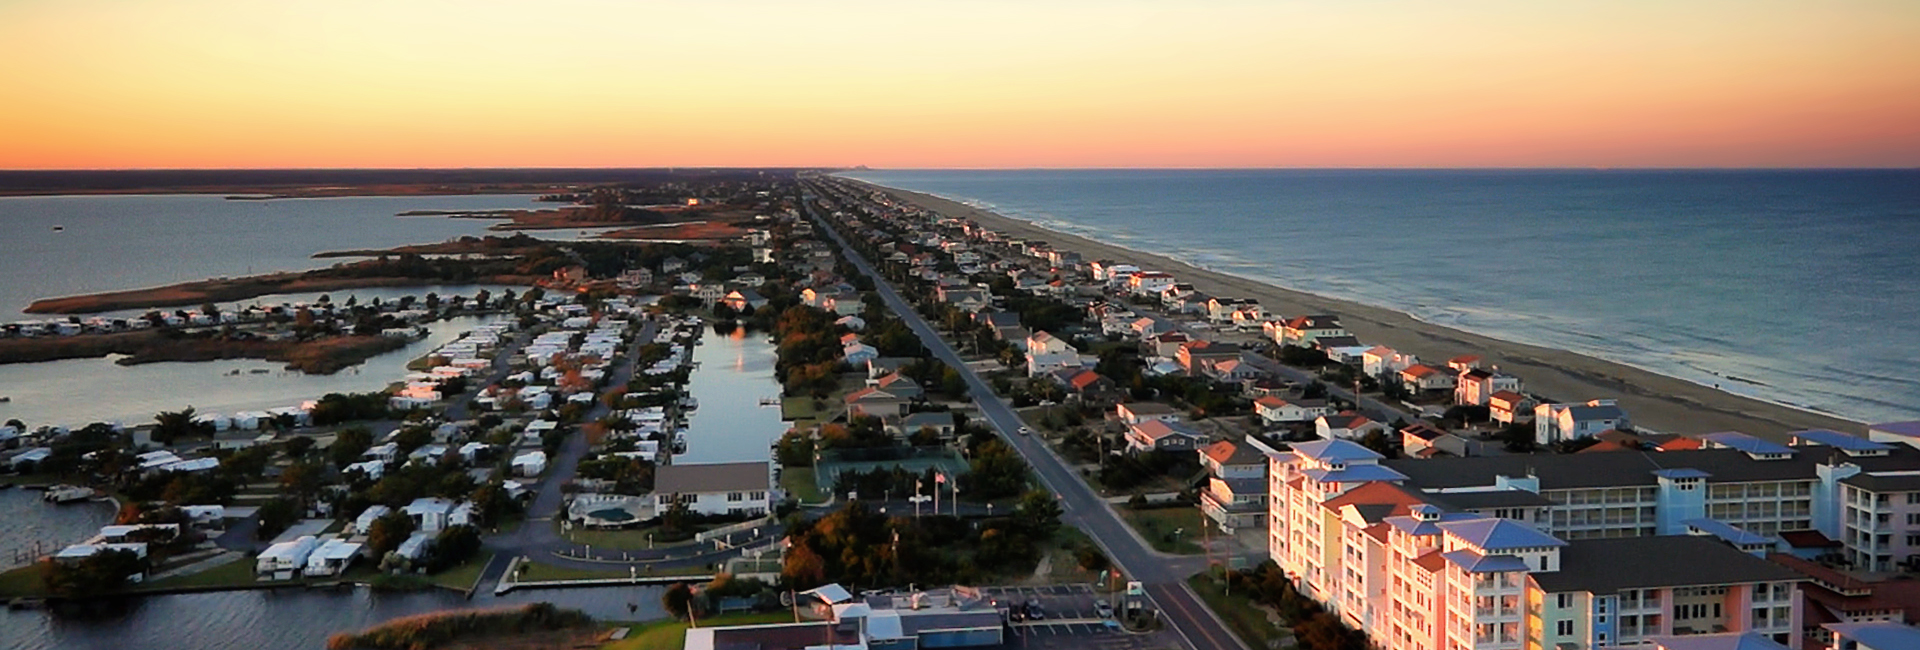 southeast virginia beach zip 23456 homes for sale